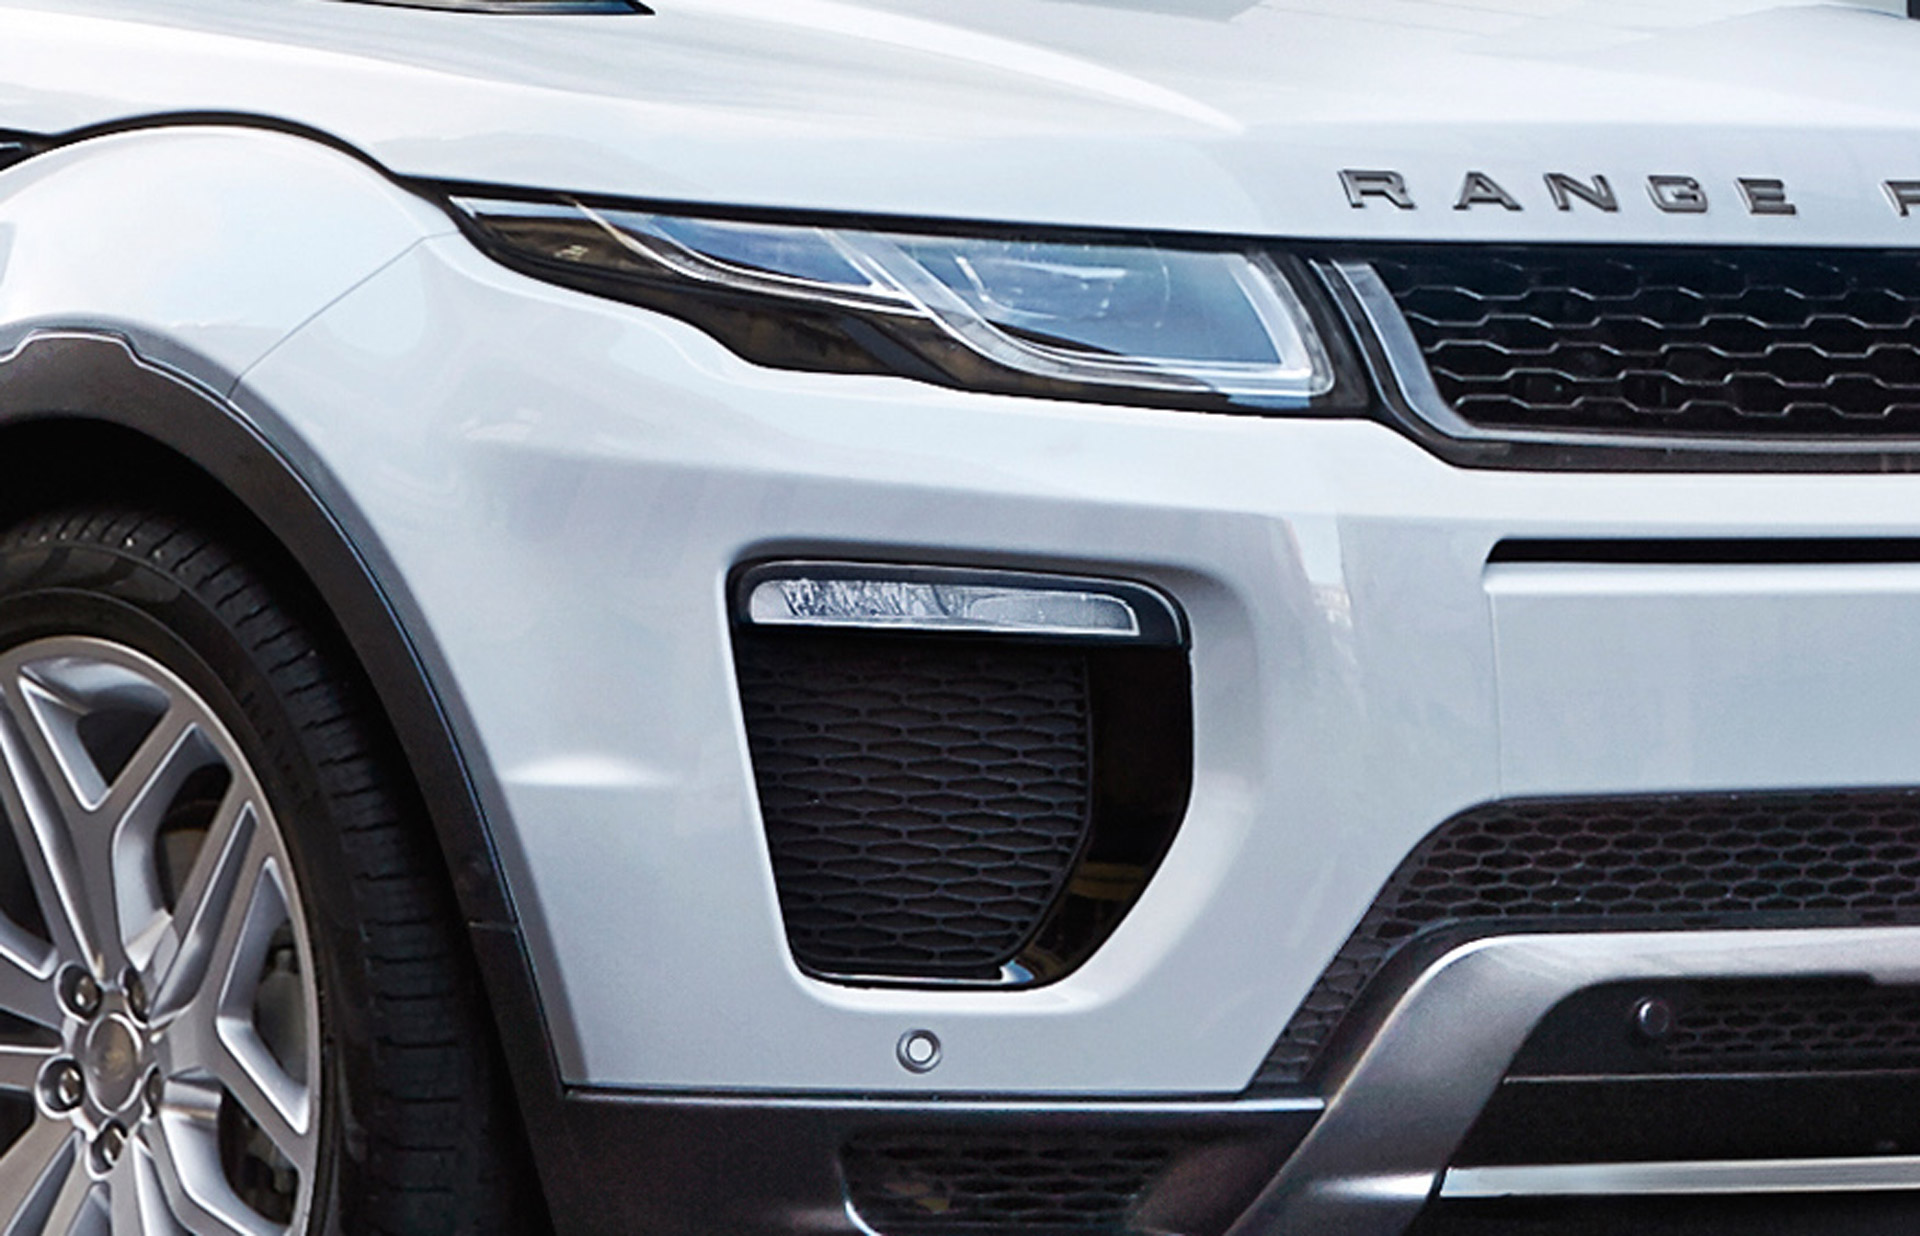 Land Rover Range Rover Evoque SVR In The Works